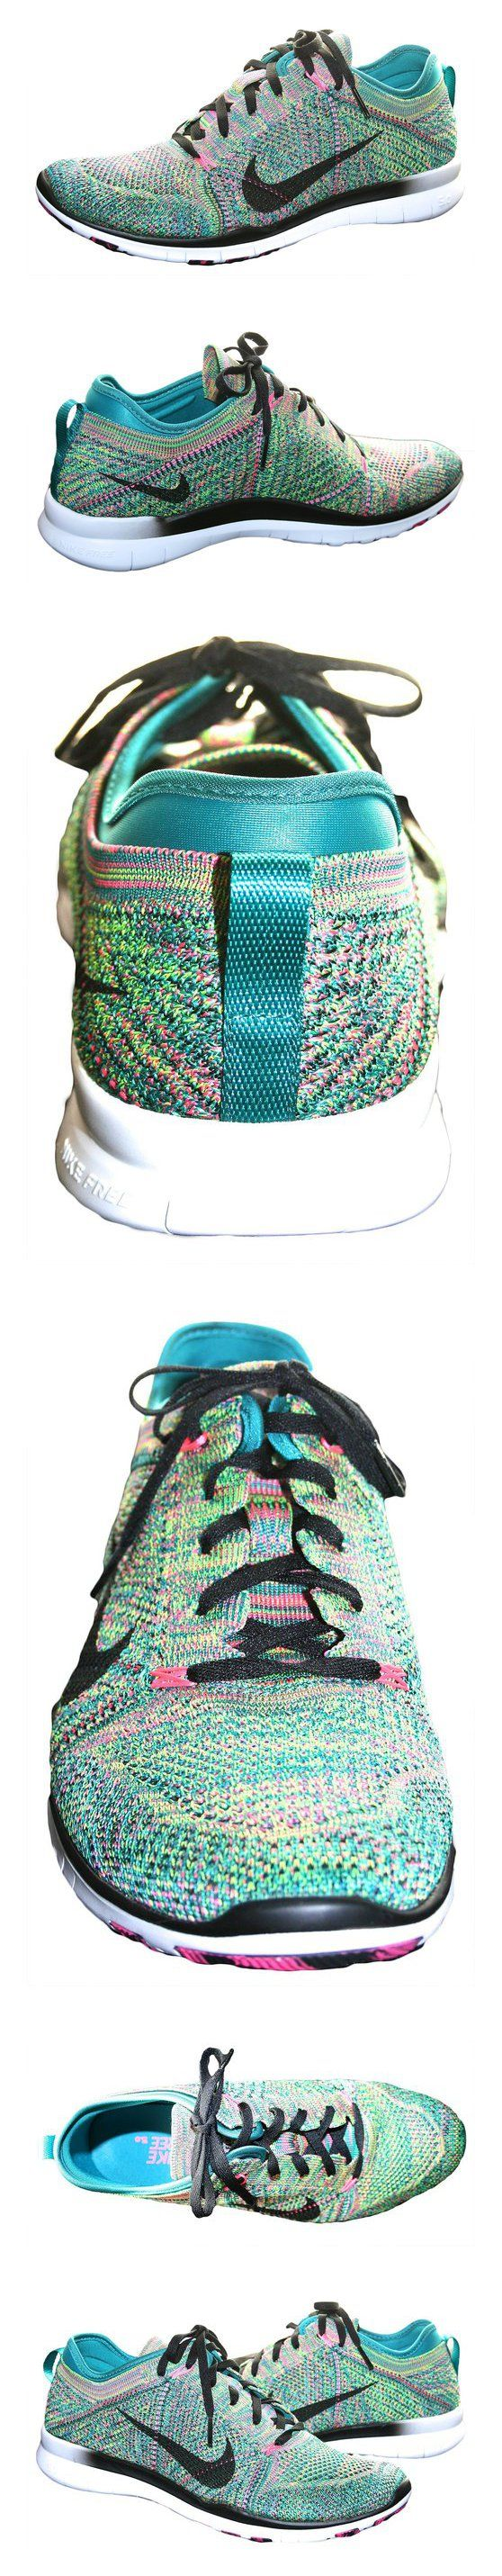 $130 - Nike Free Tr Flyknit Womens Cross Training Shoes #shoes #nike